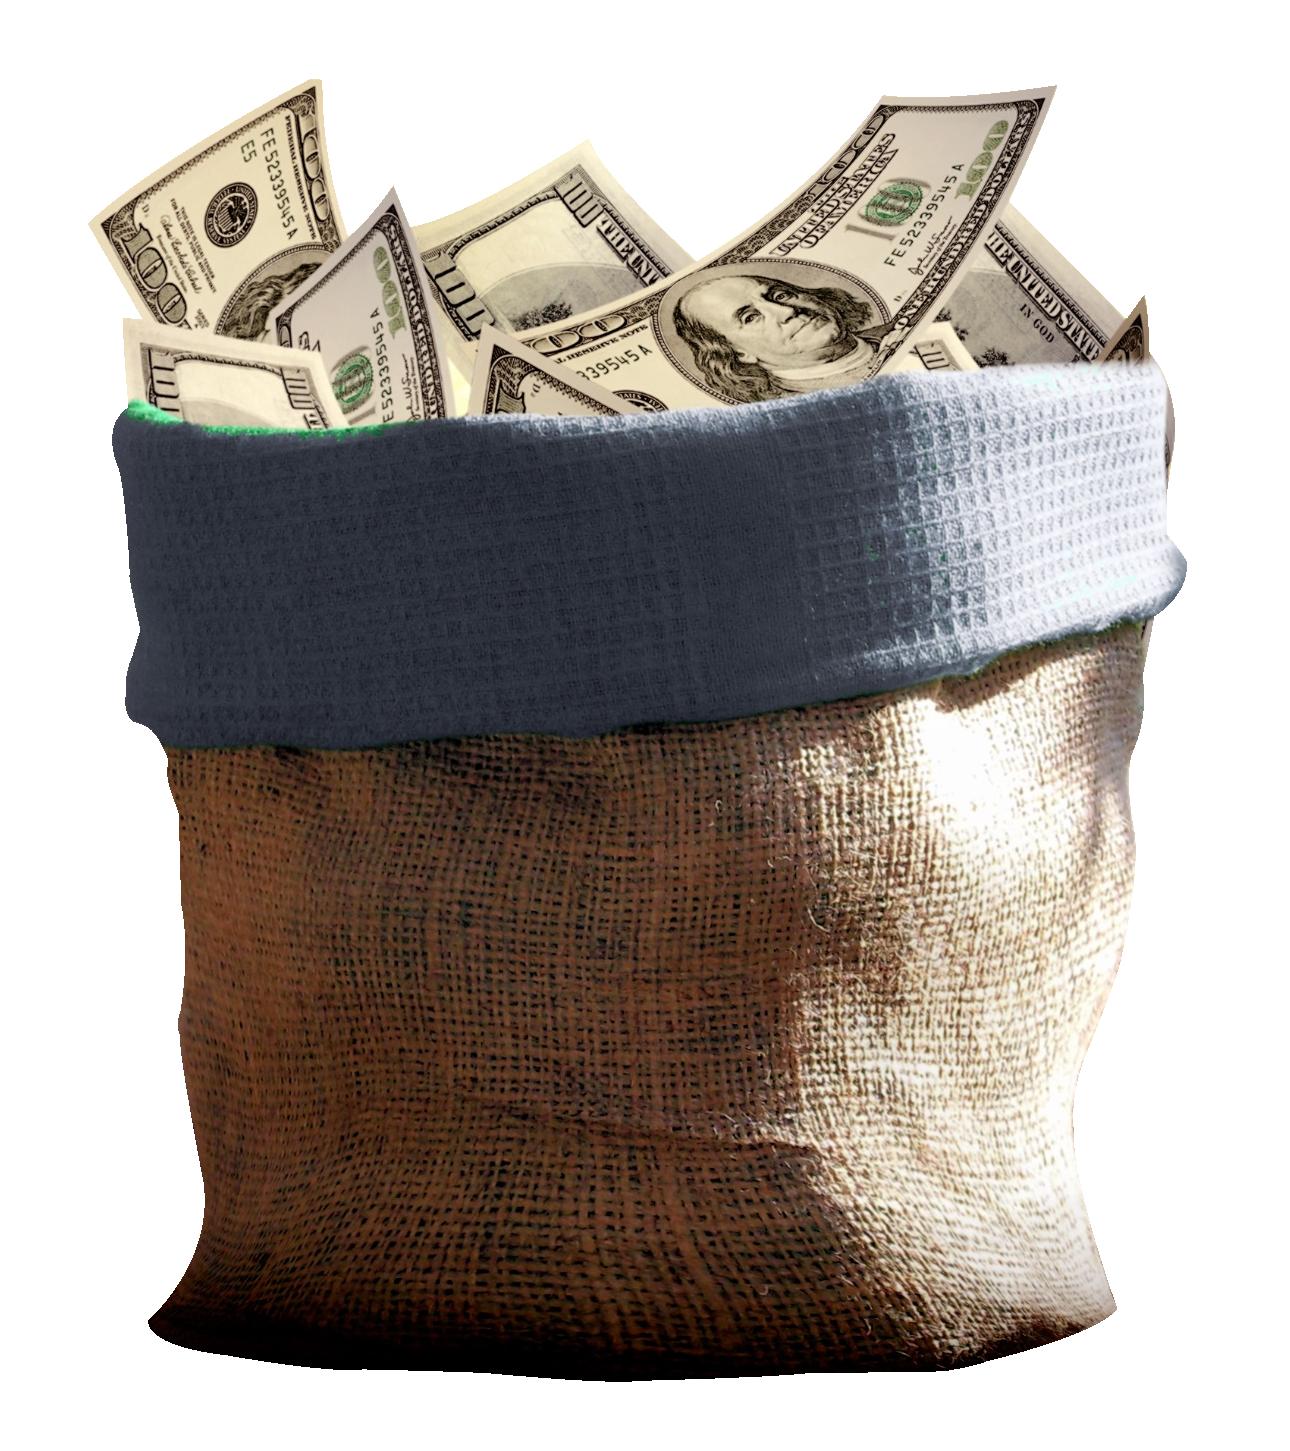 Money Bag PNG Image - PngPix - Cash Money Bag